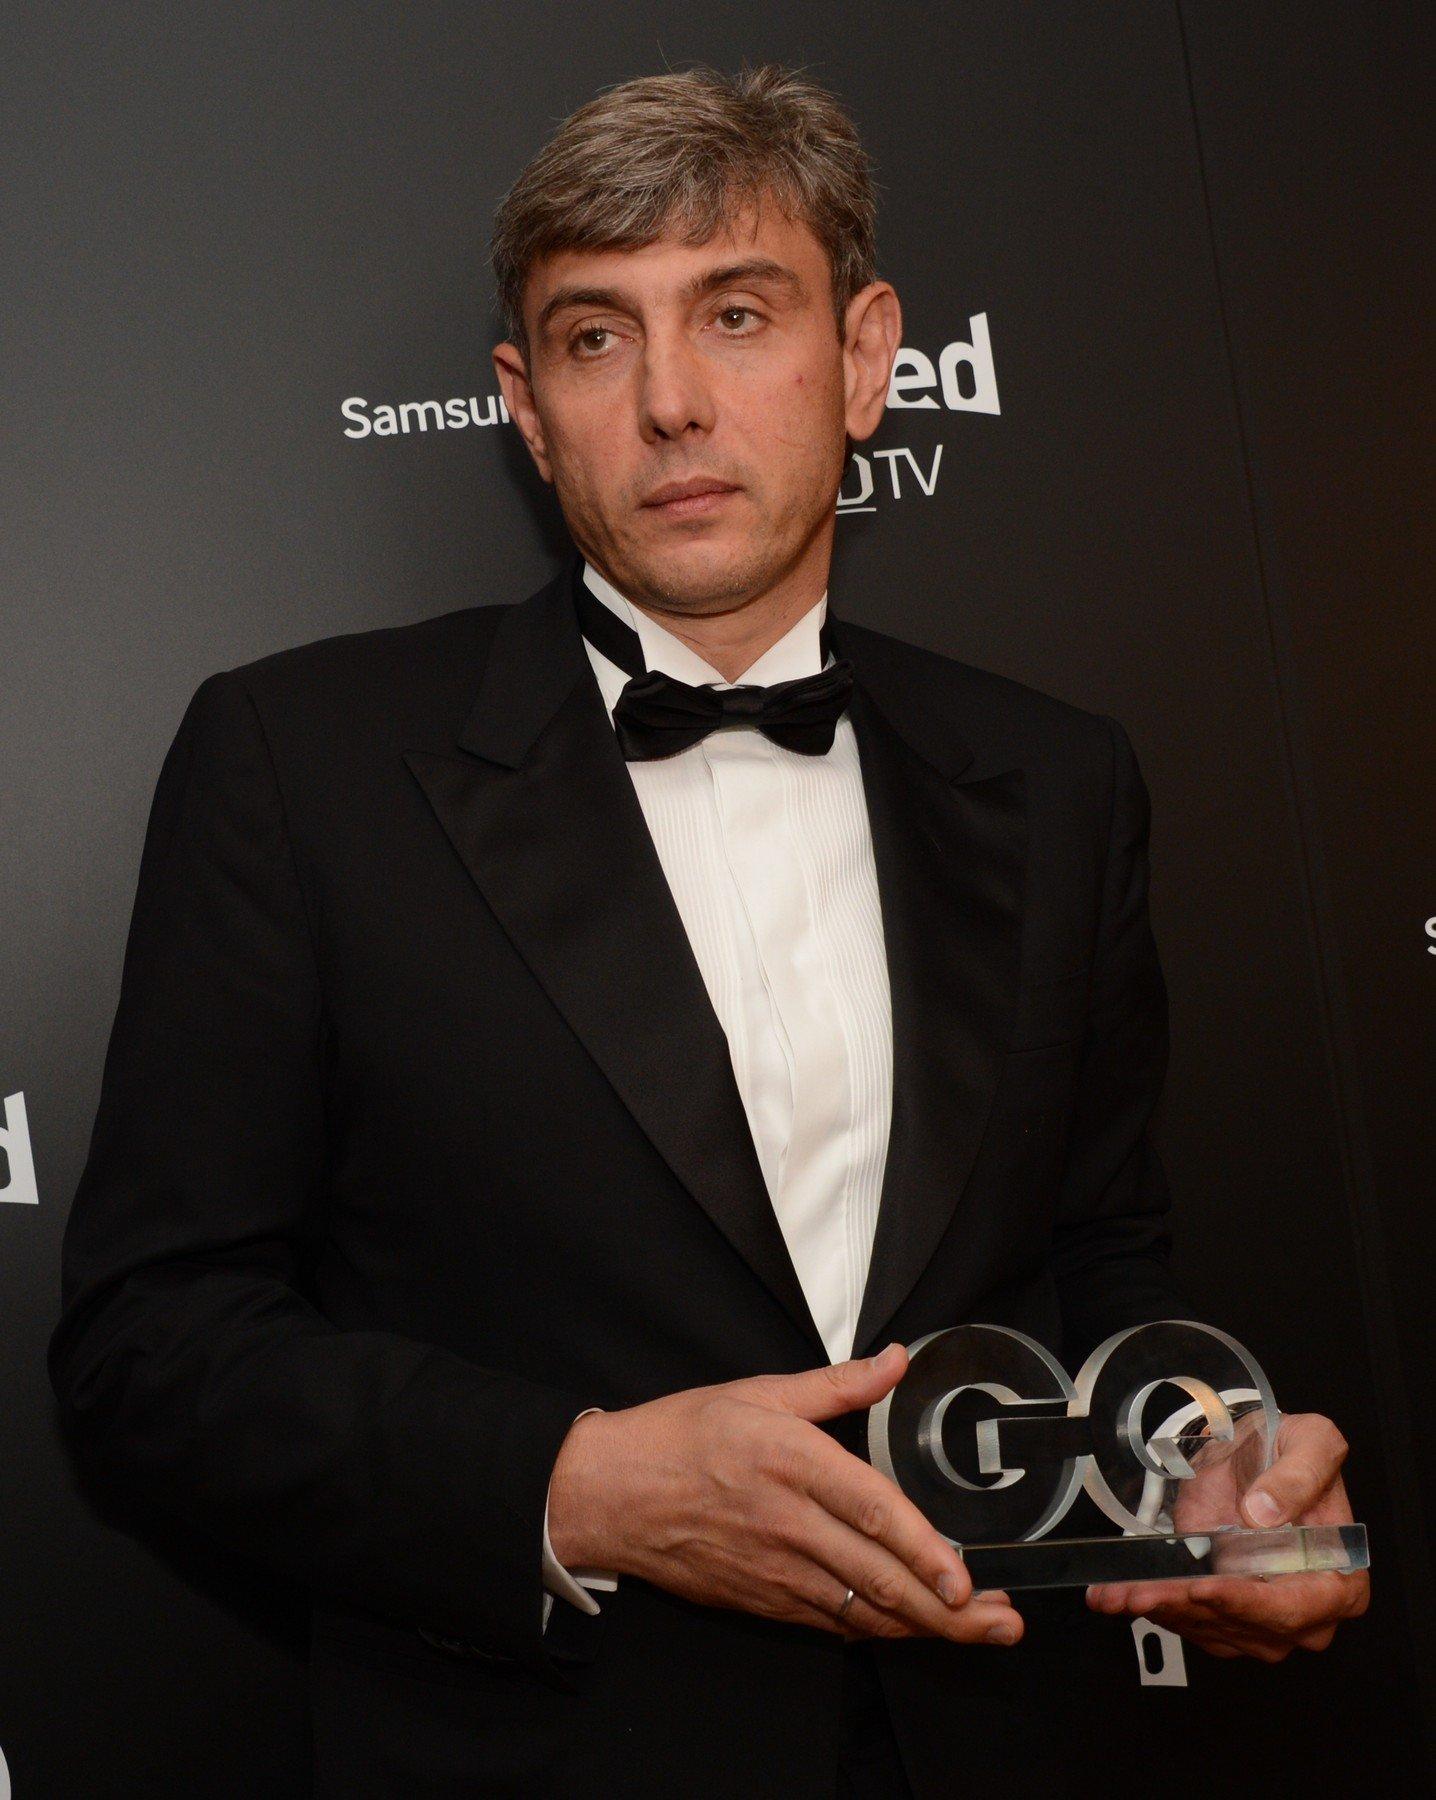 2494574 09/16/2014 Sergey Galitsky, who won in the category